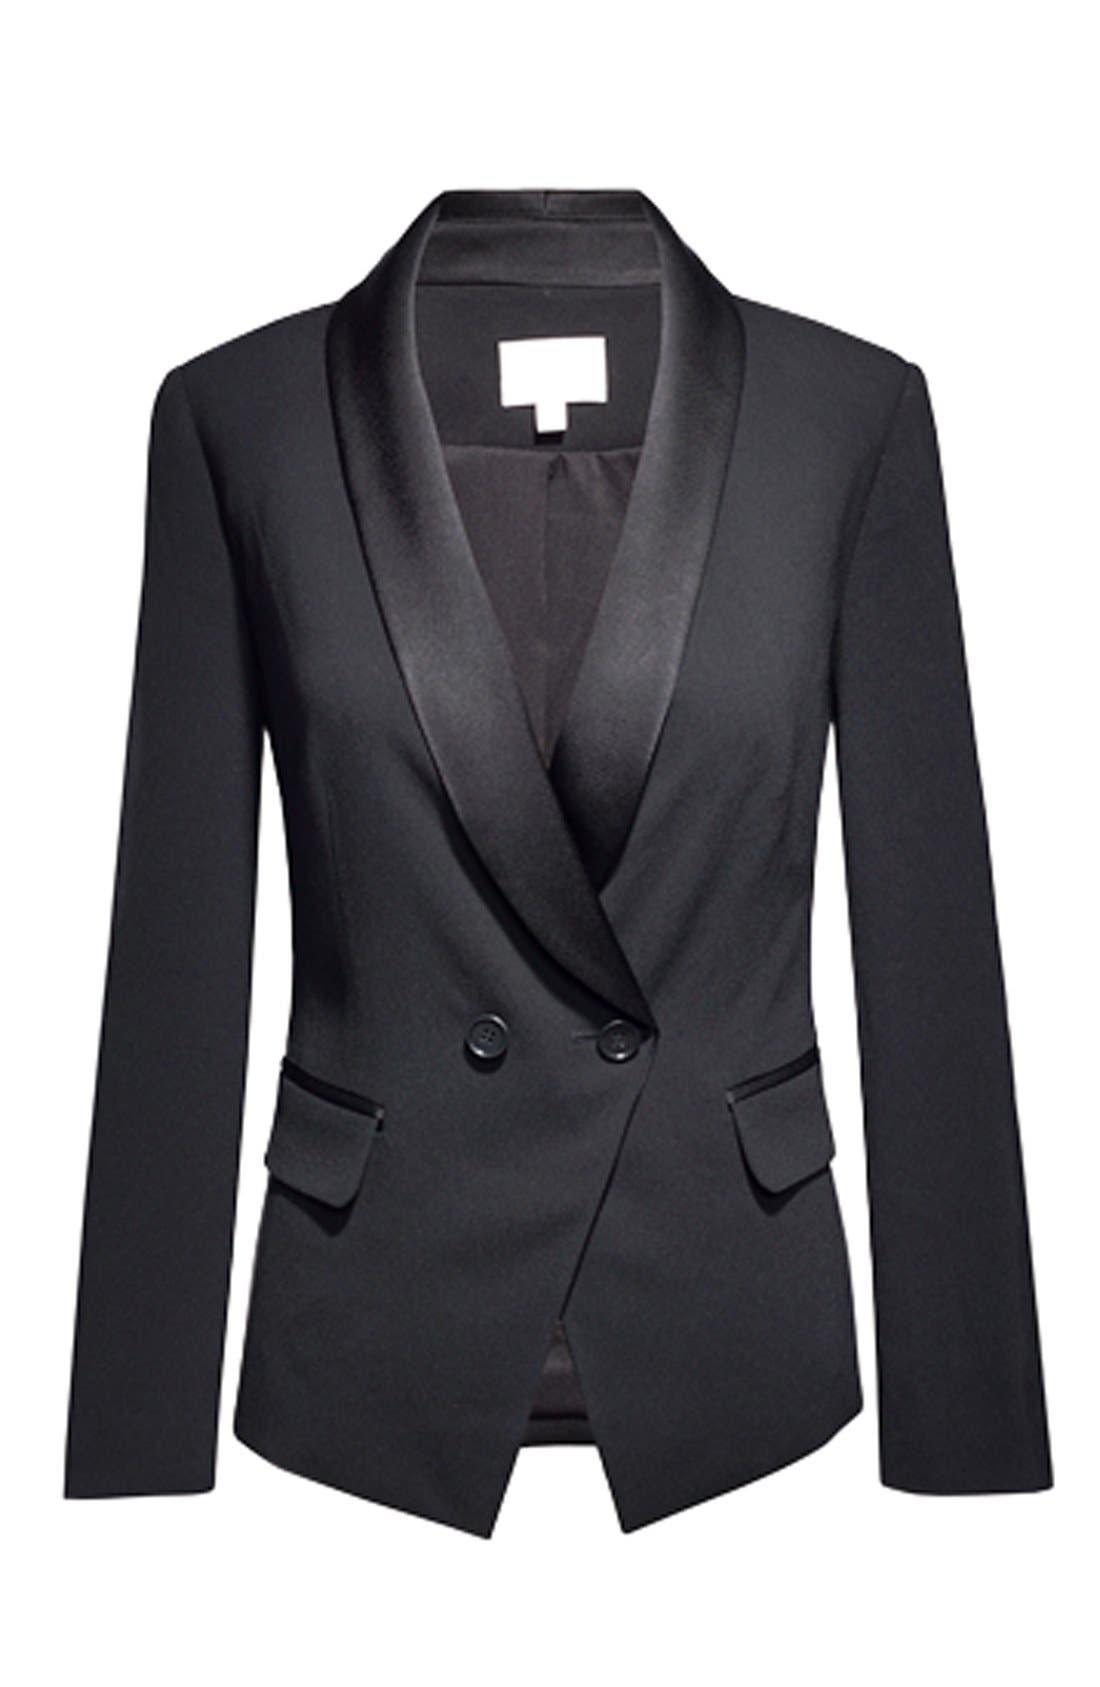 Main Image - Chelsea28 Jacket, Top & Pants